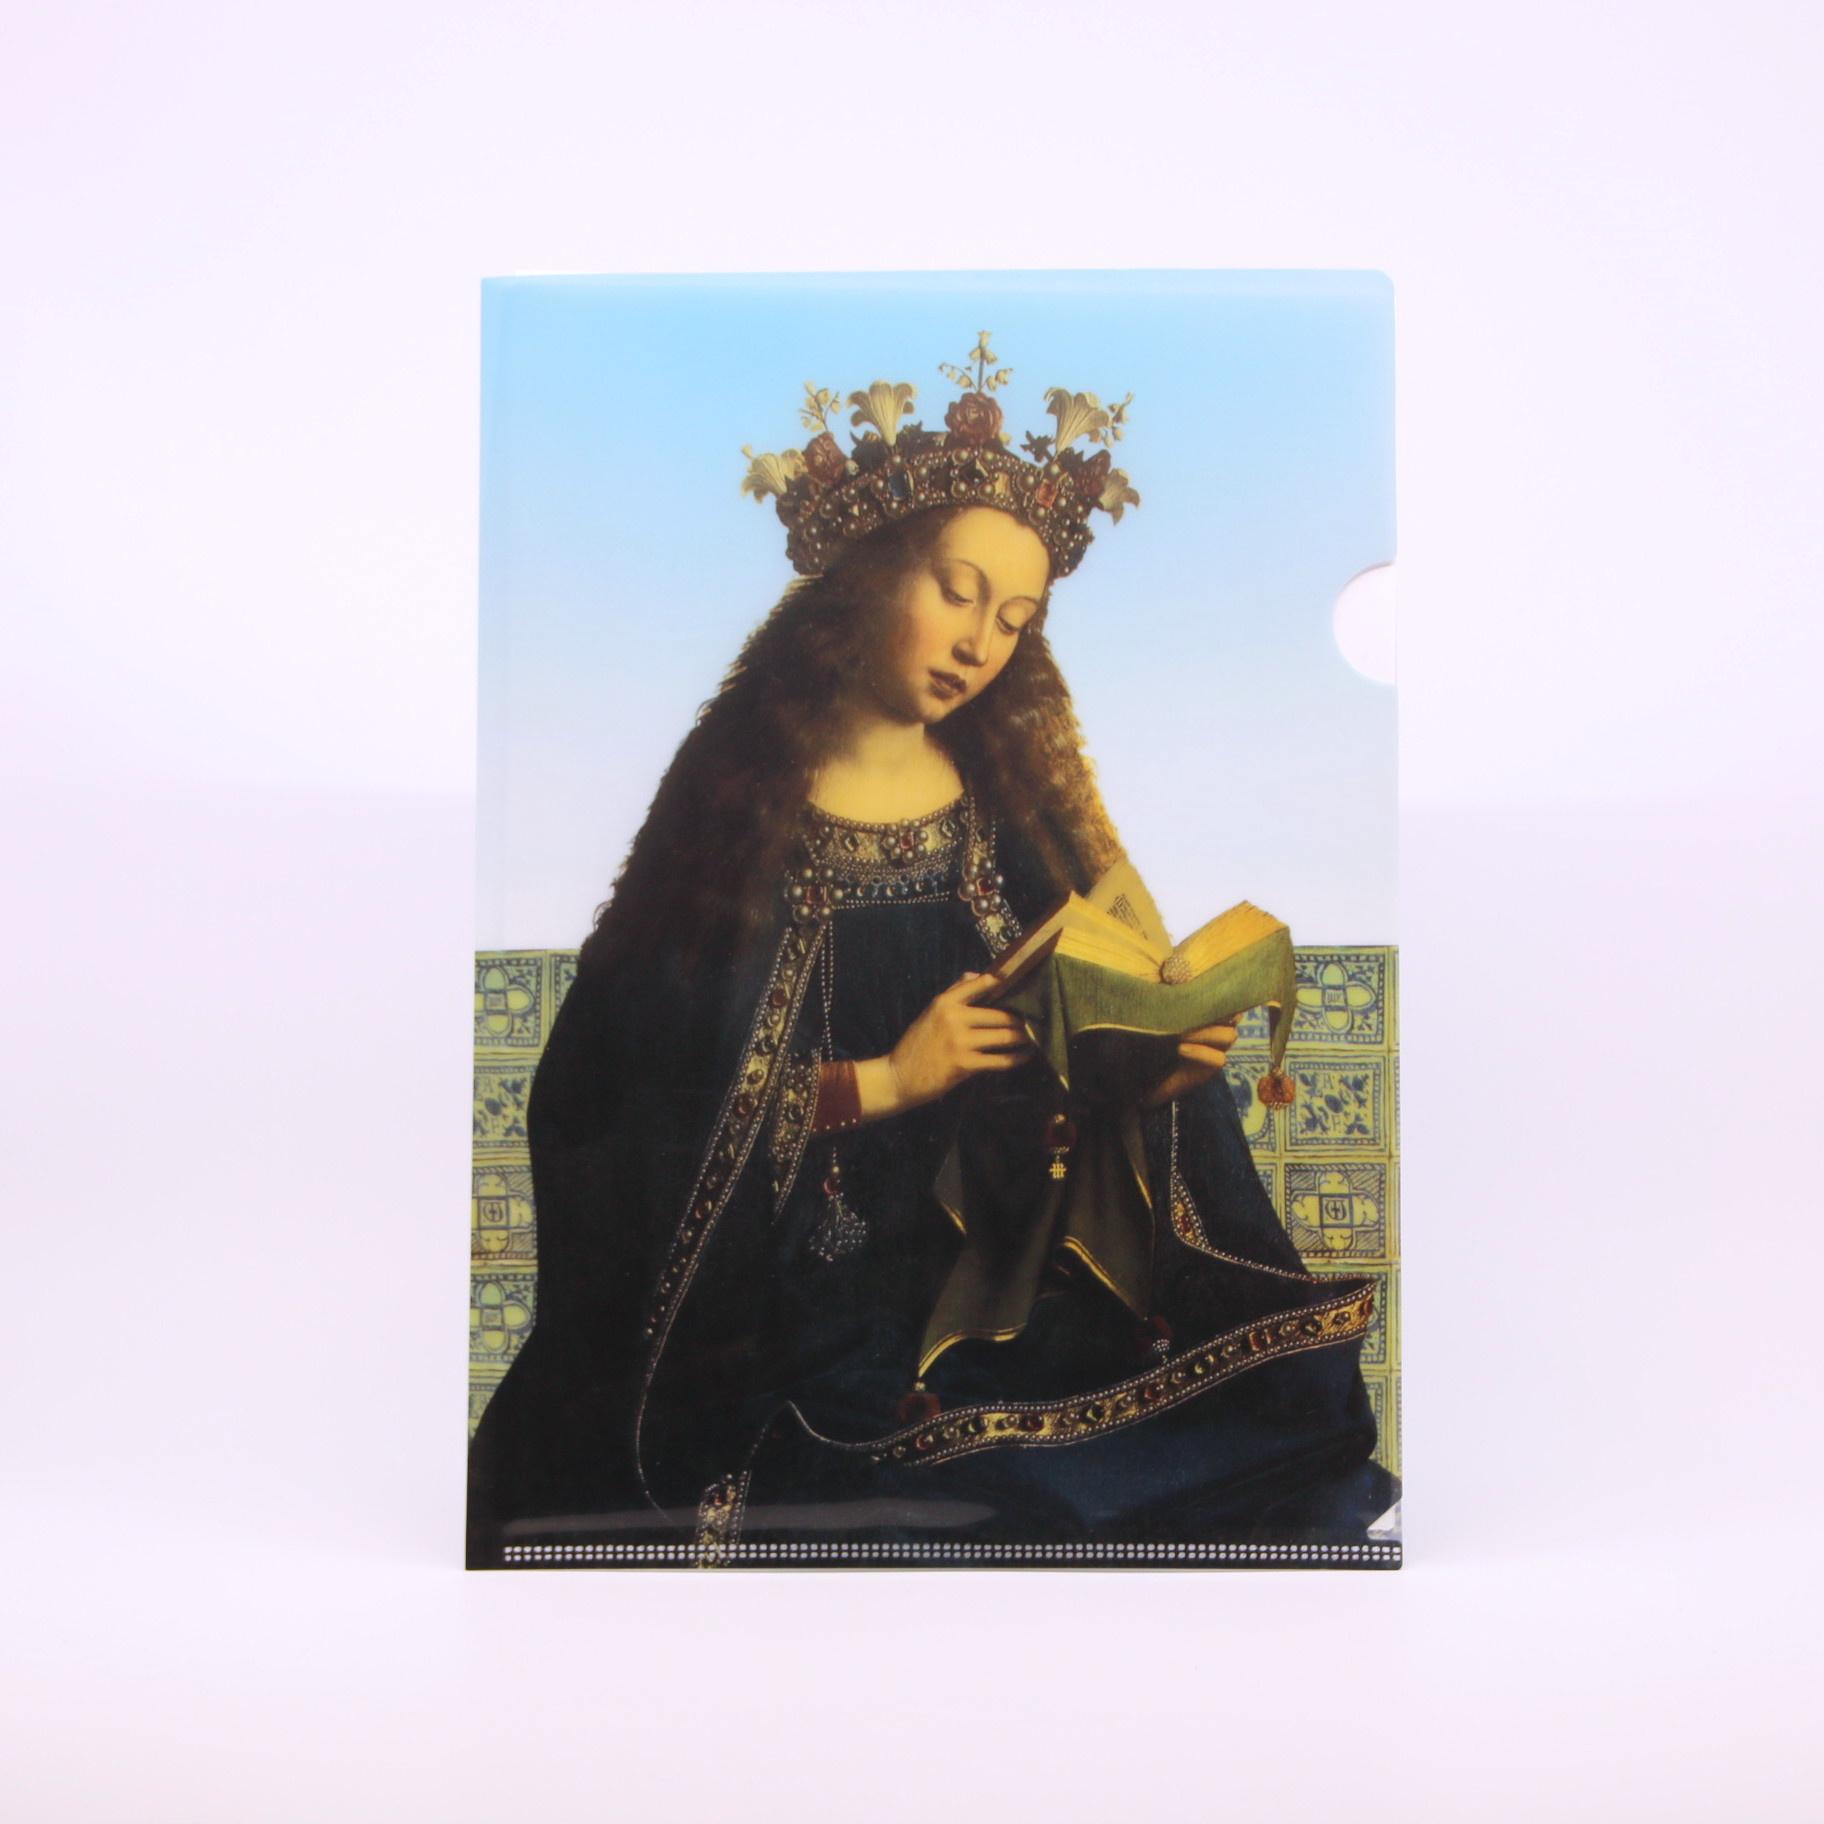 Sint-Baafskathedraal A4-mapje met afbeelding van Maria